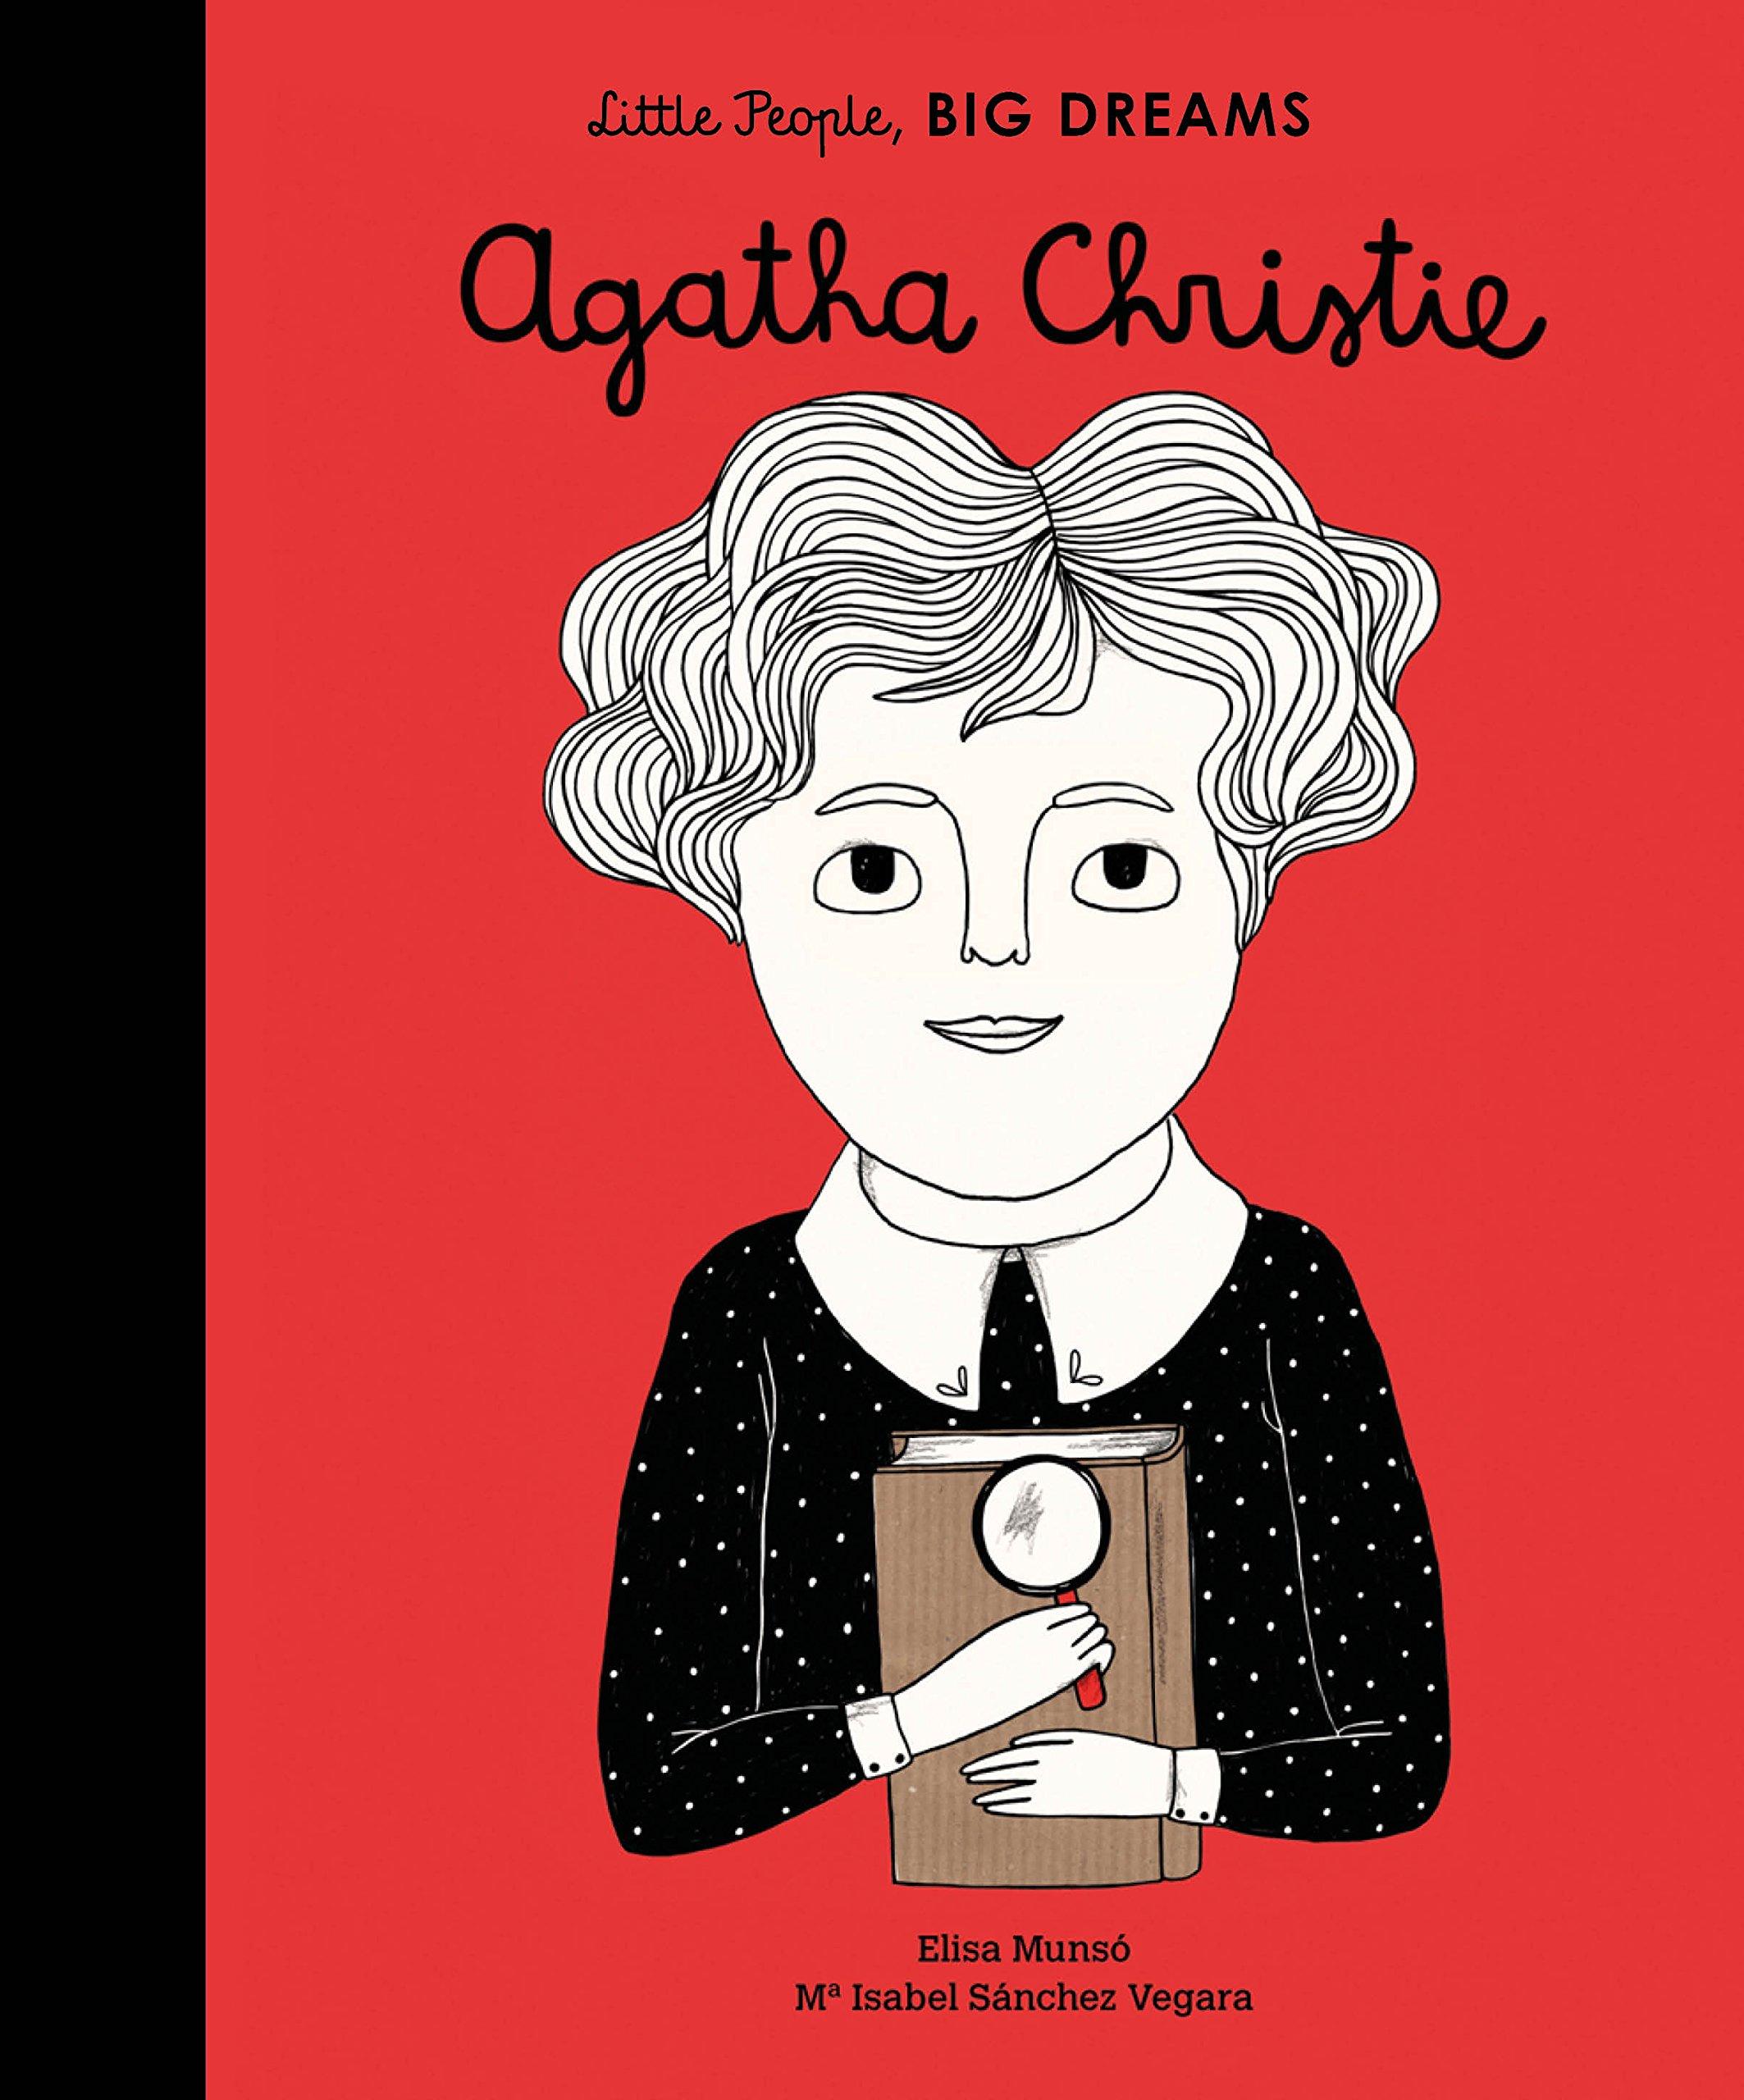 Agatha Christie: 5 (Little People, Big Dreams): Amazon.co.uk: Sanchez  Vegara, Isabel, Munso, Elisa: Books